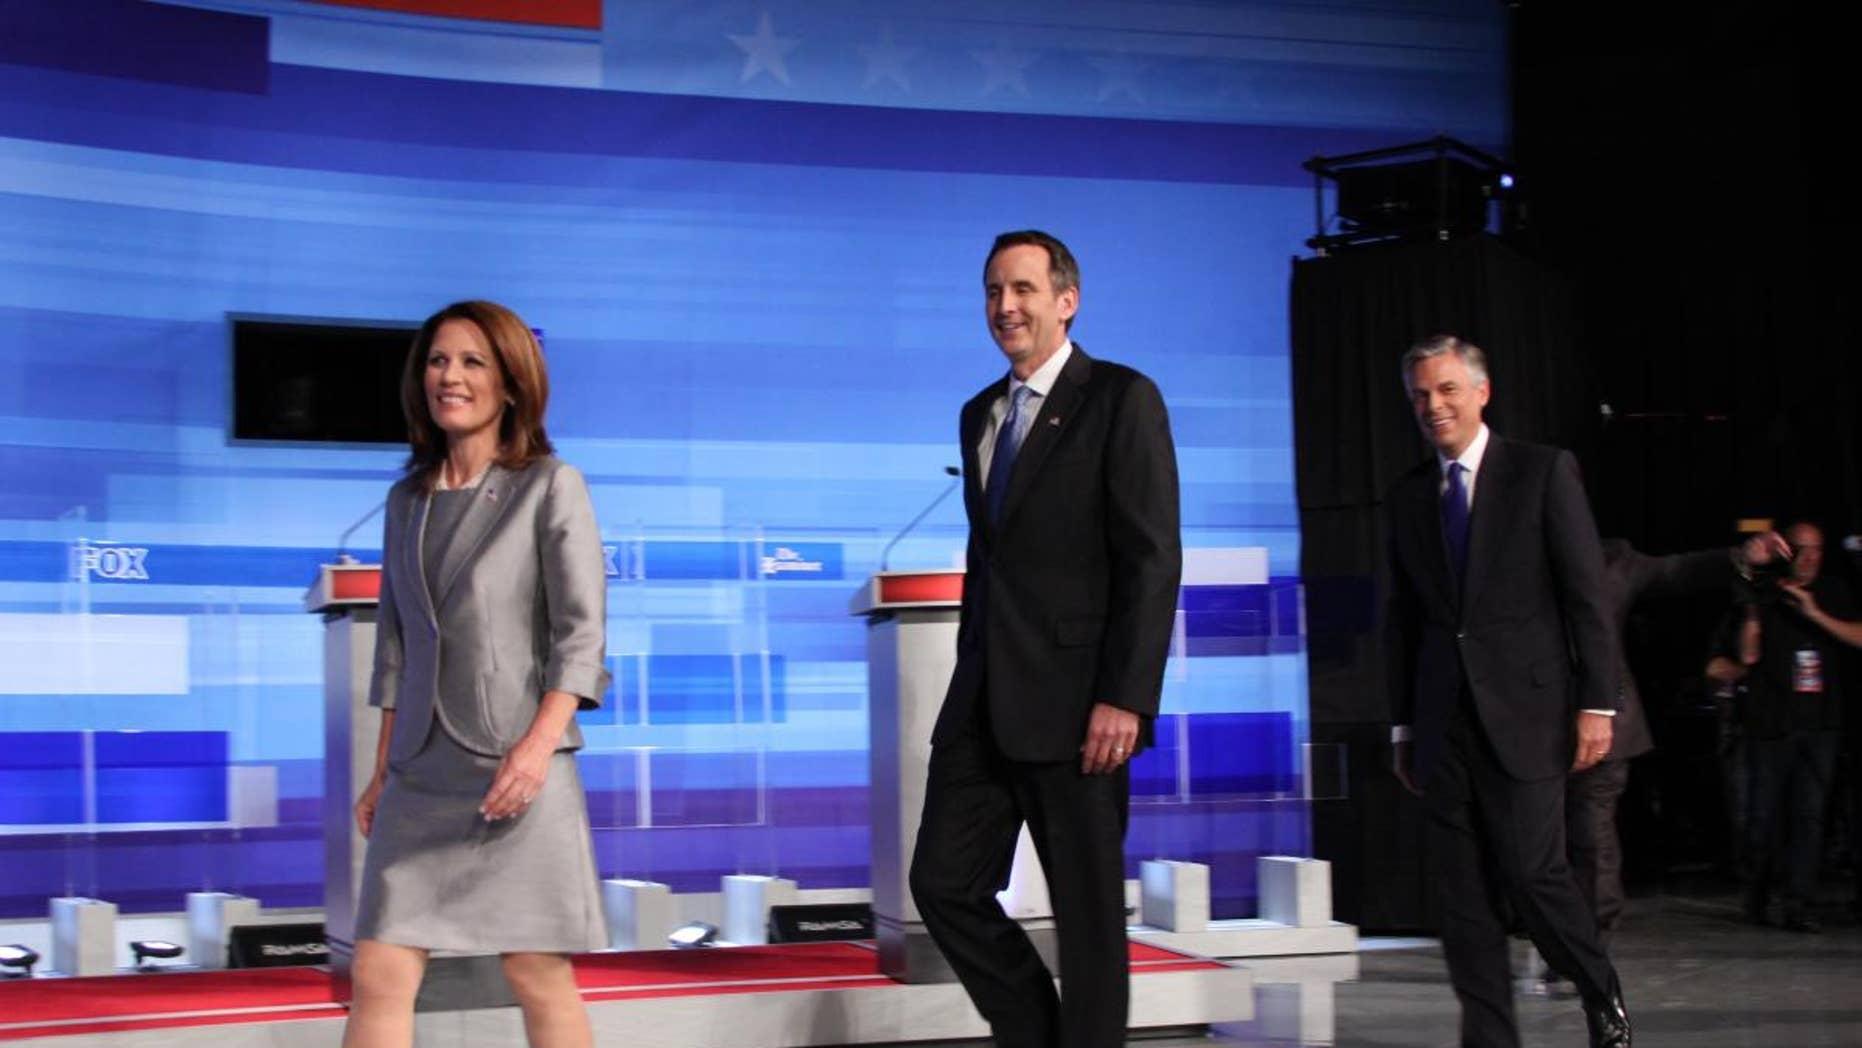 Candidates Michele Bachmann, Tim Pawlenty and Jon Huntsman take the stage at Thursday's Fox News, Washington Examiner, Iowa GOP presidential debate. (Fox News Photo)